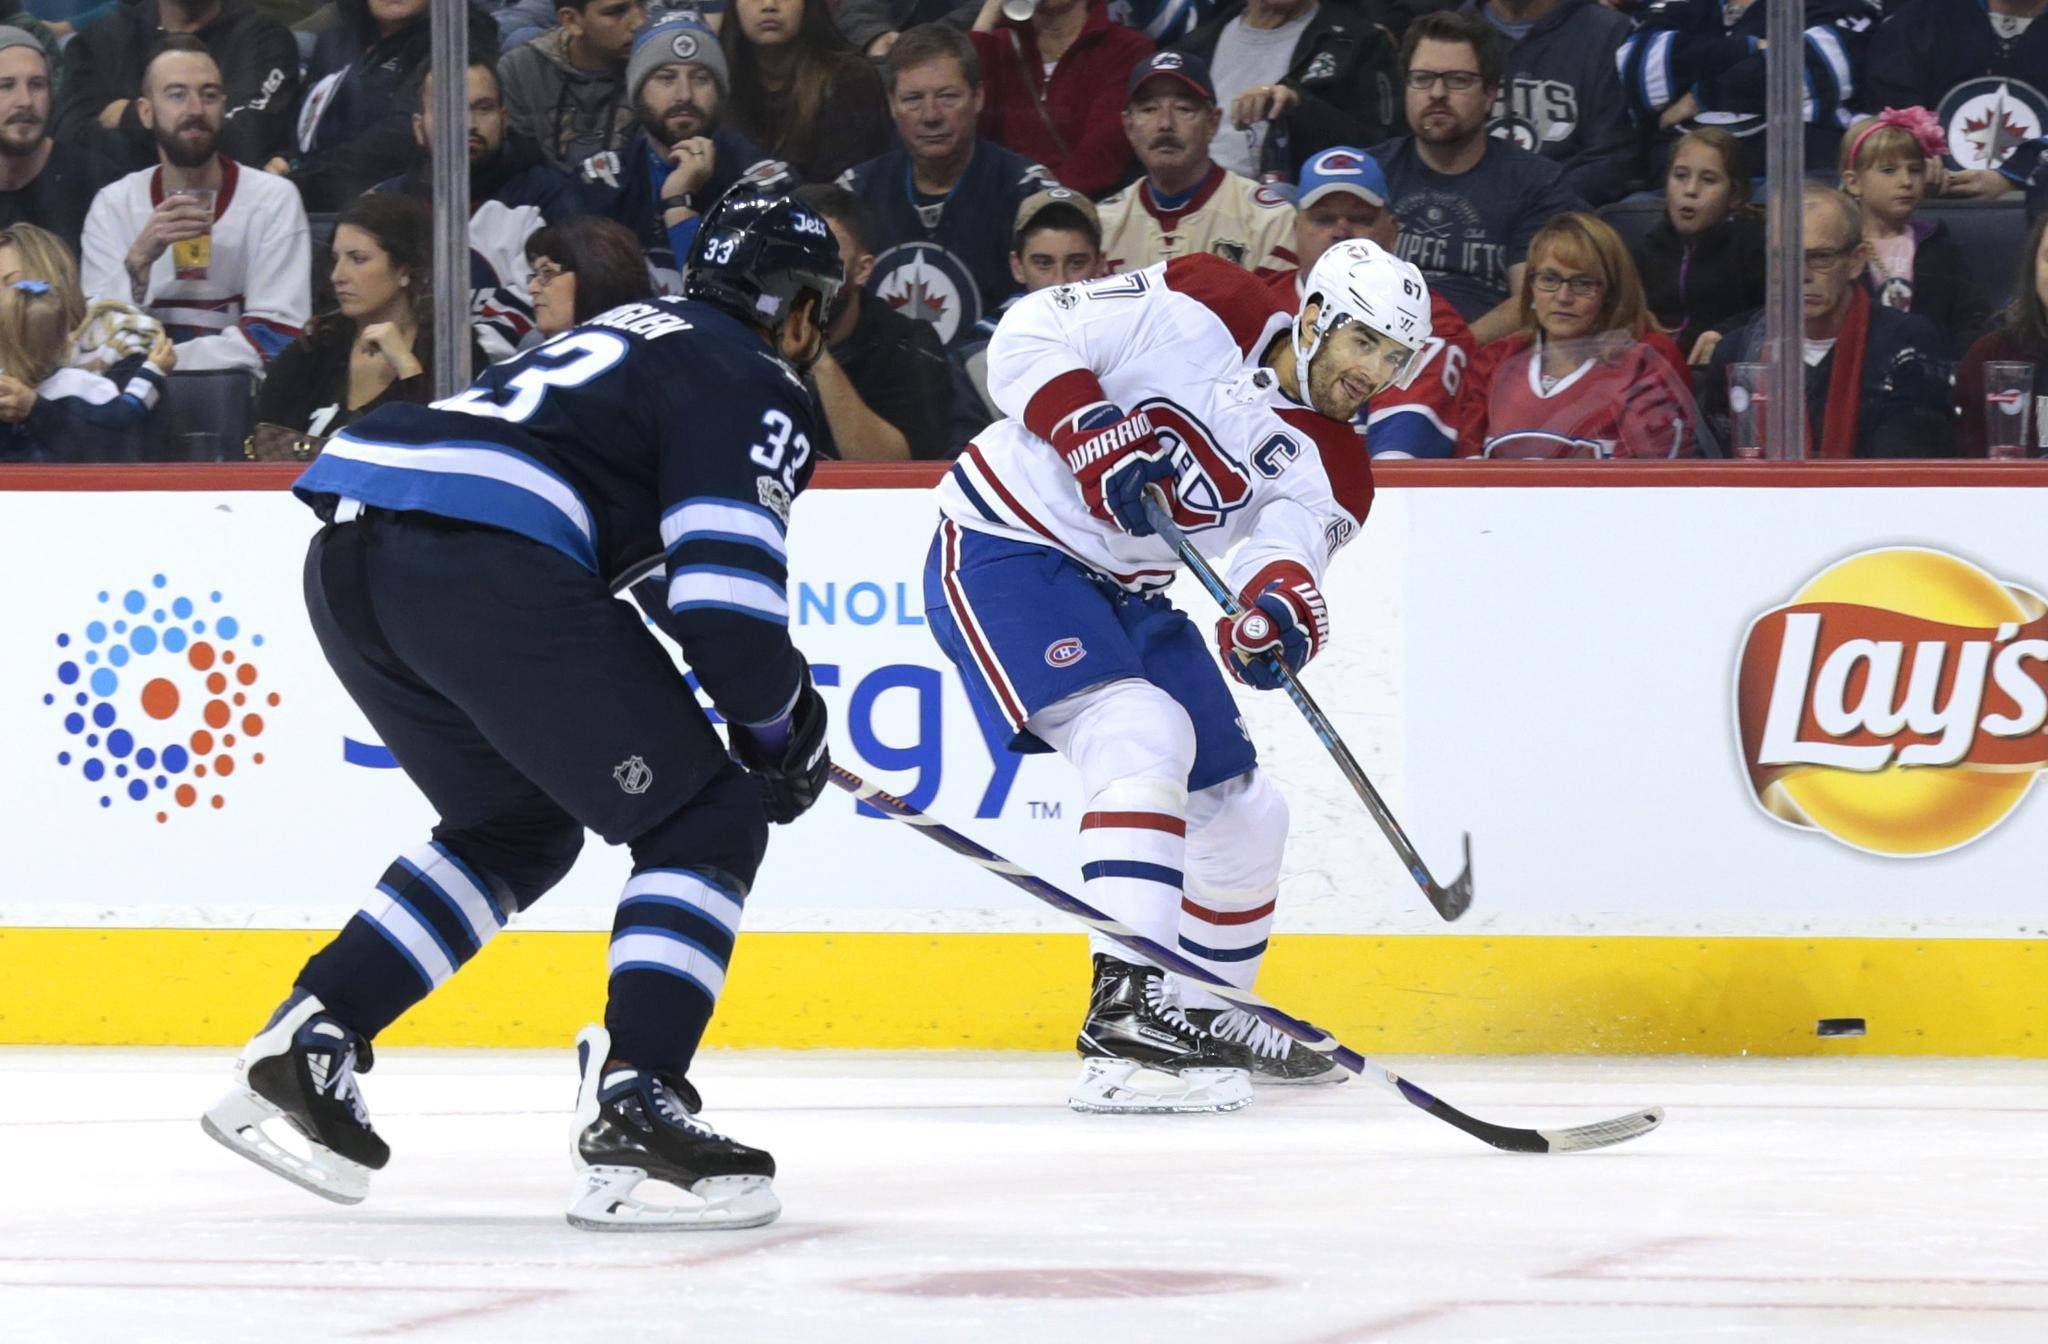 Max 80 Winnipeg >> Max Pacioretty Scores Overtime Winner Lifting Montreal